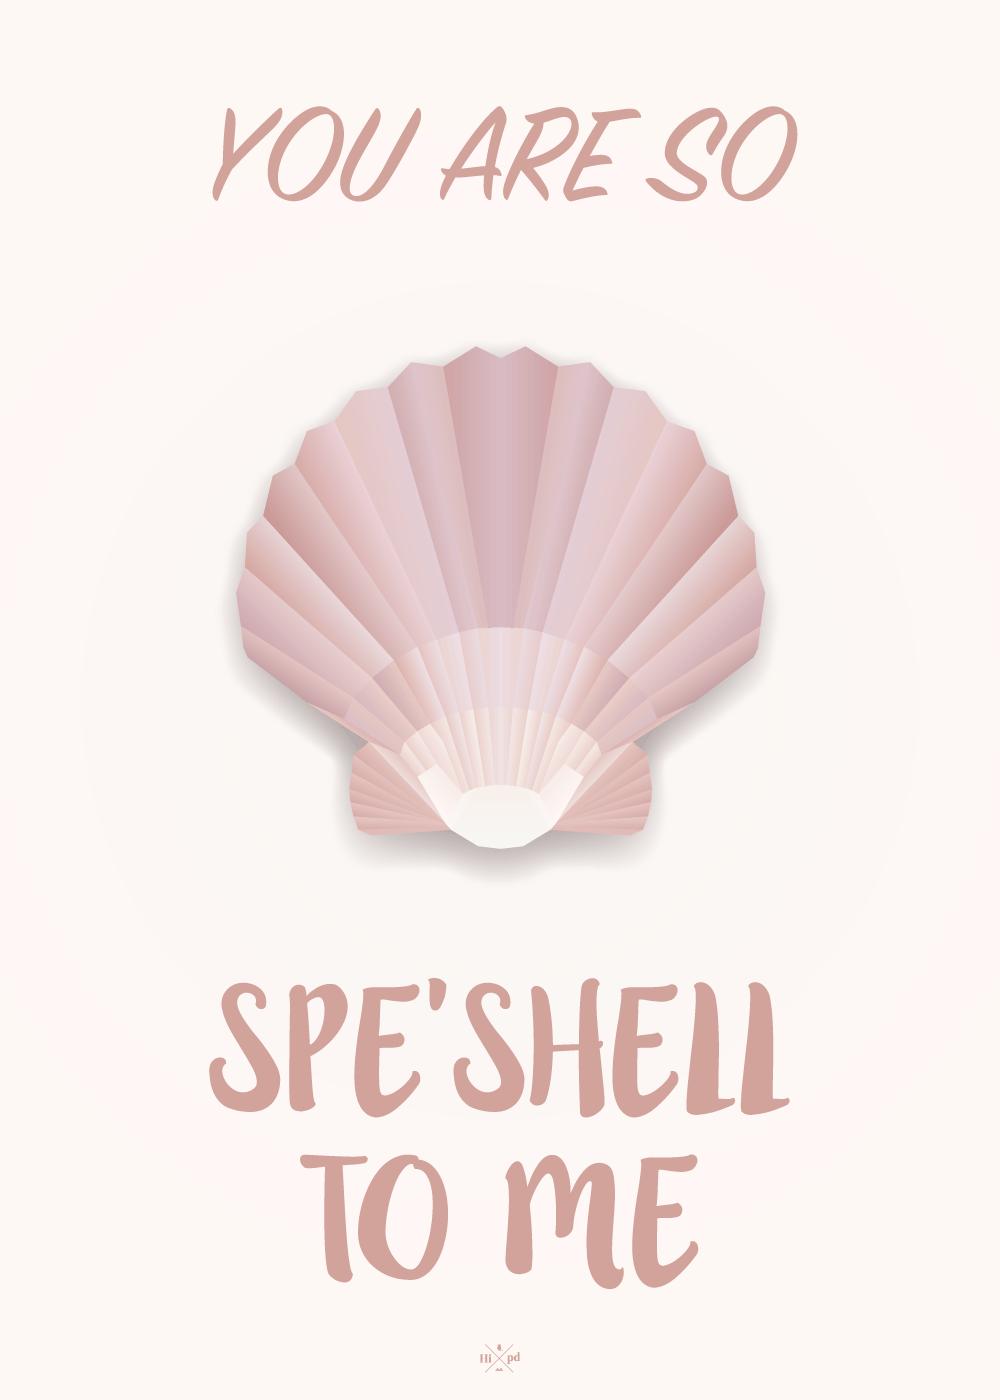 Spe'shell